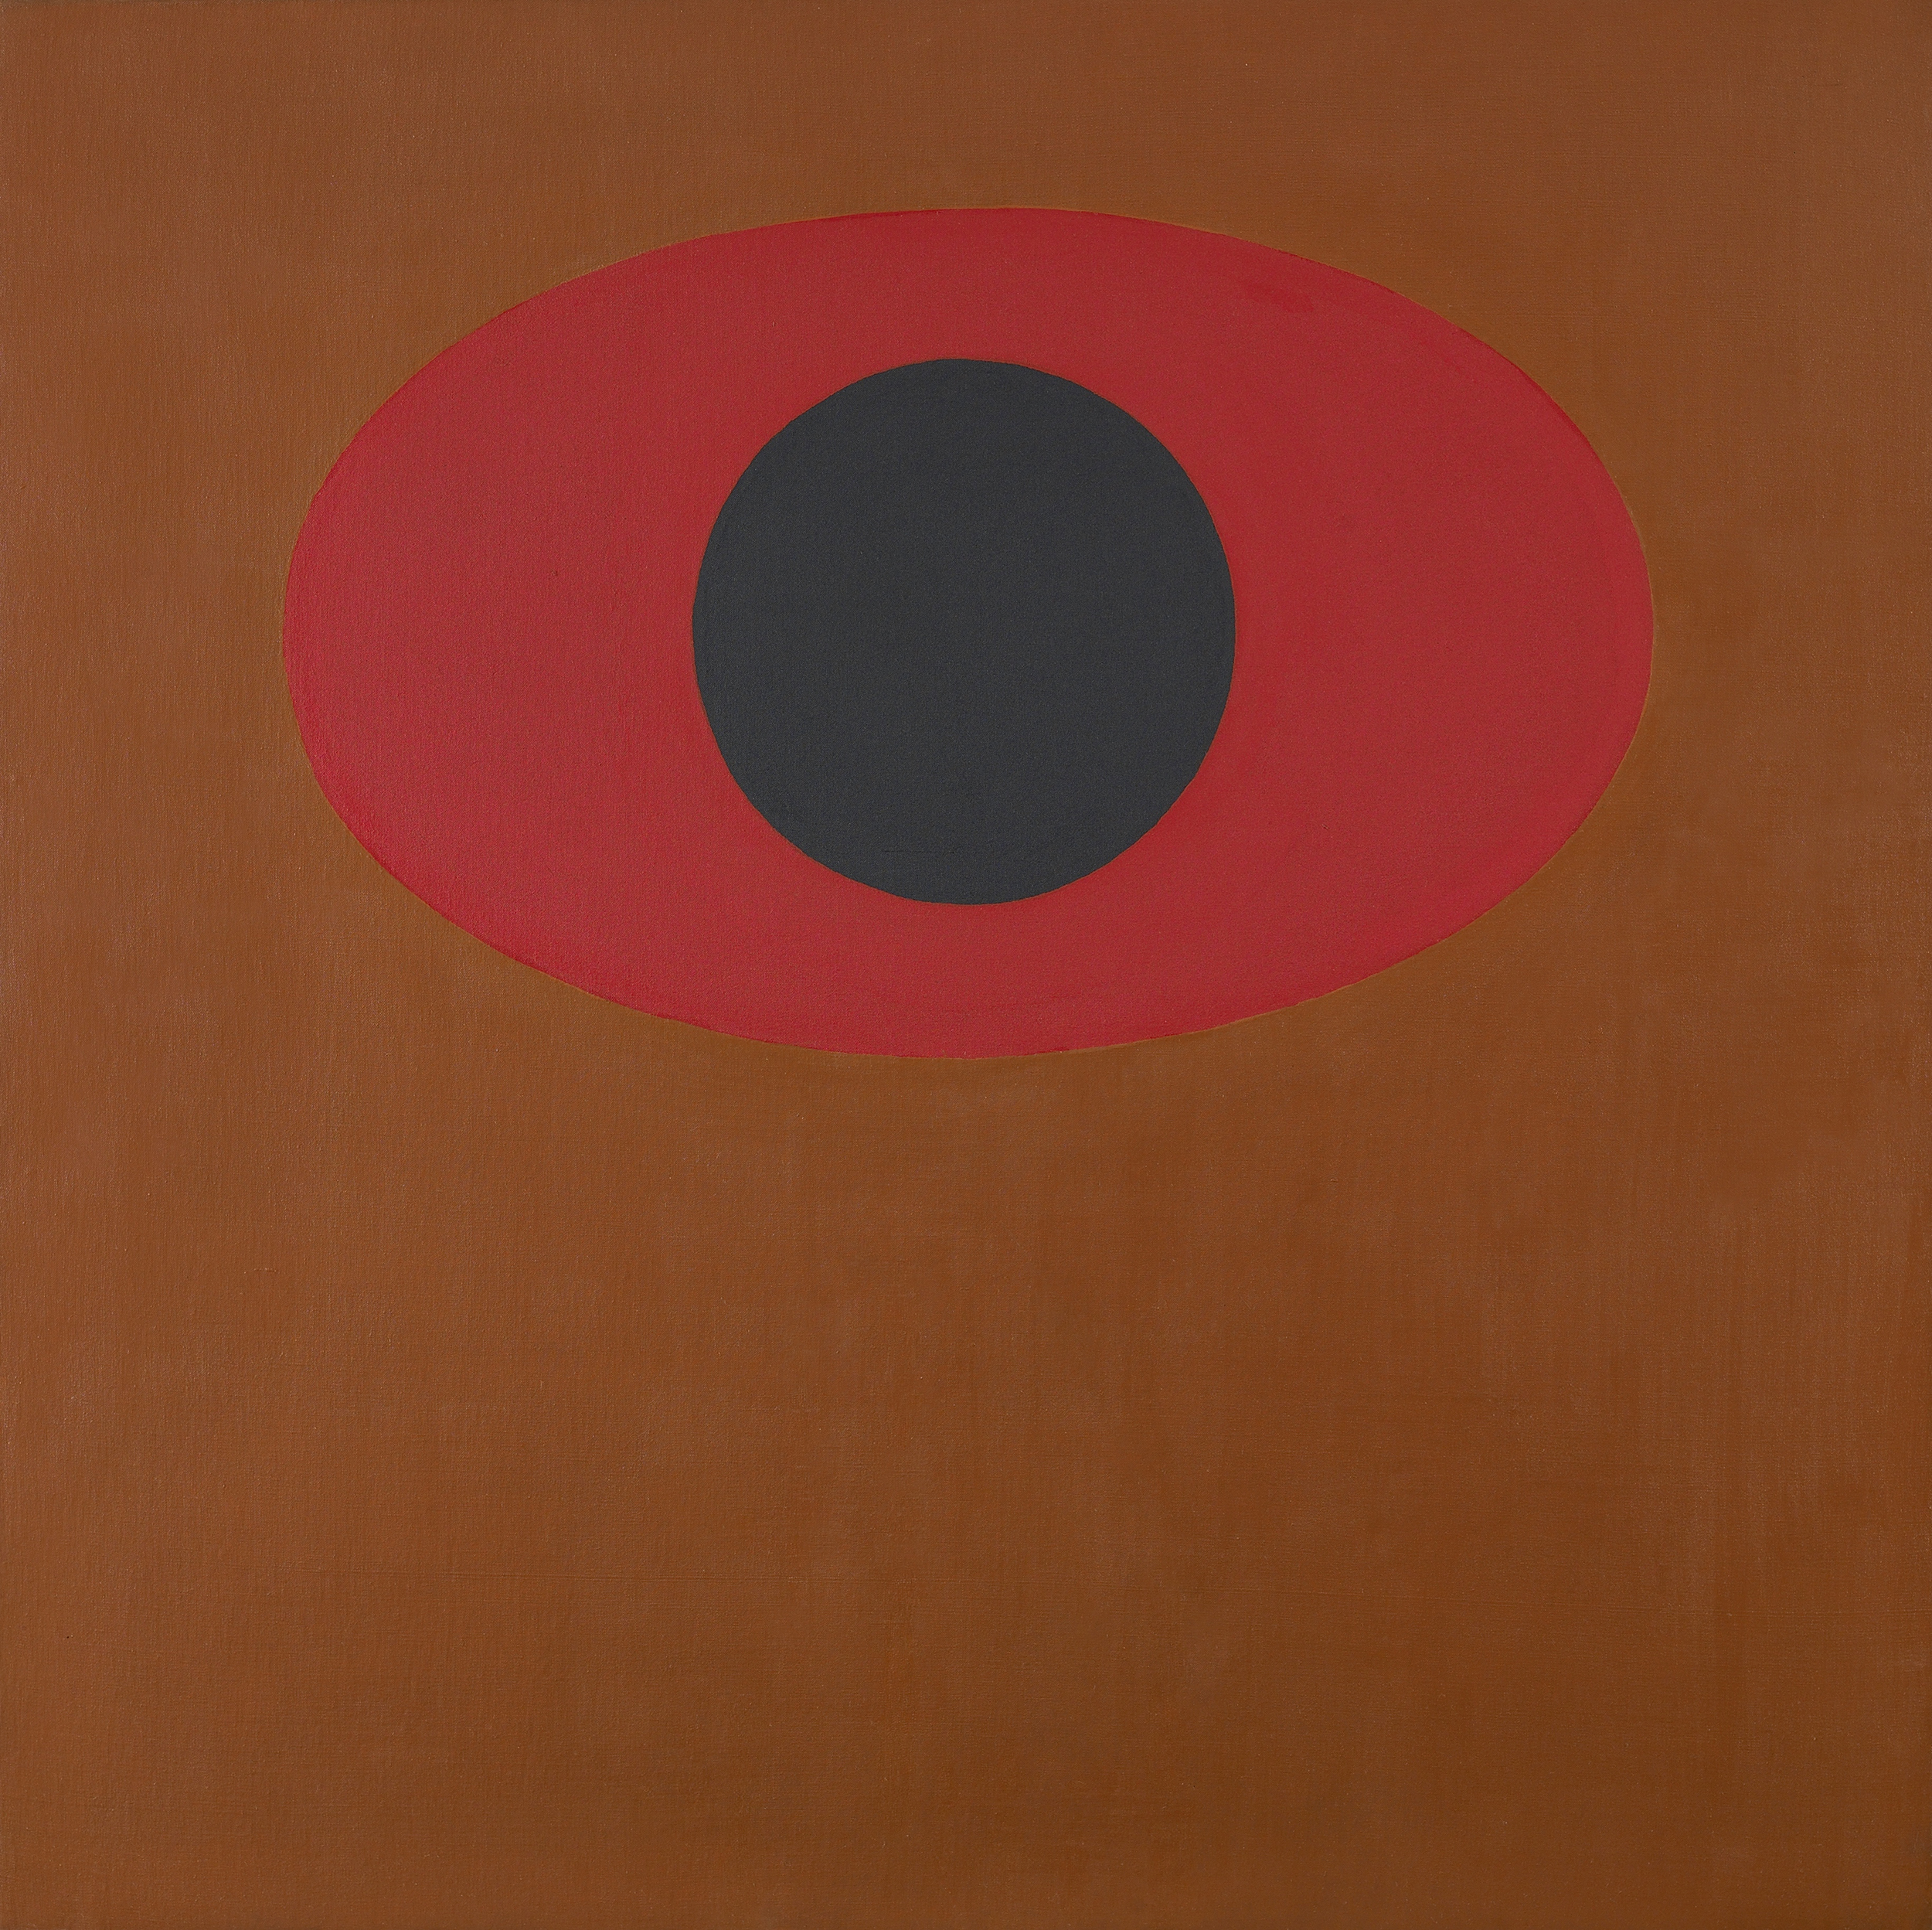 Brazilian Light,   1964, Acrylic on canvas, 45 x 45 inches